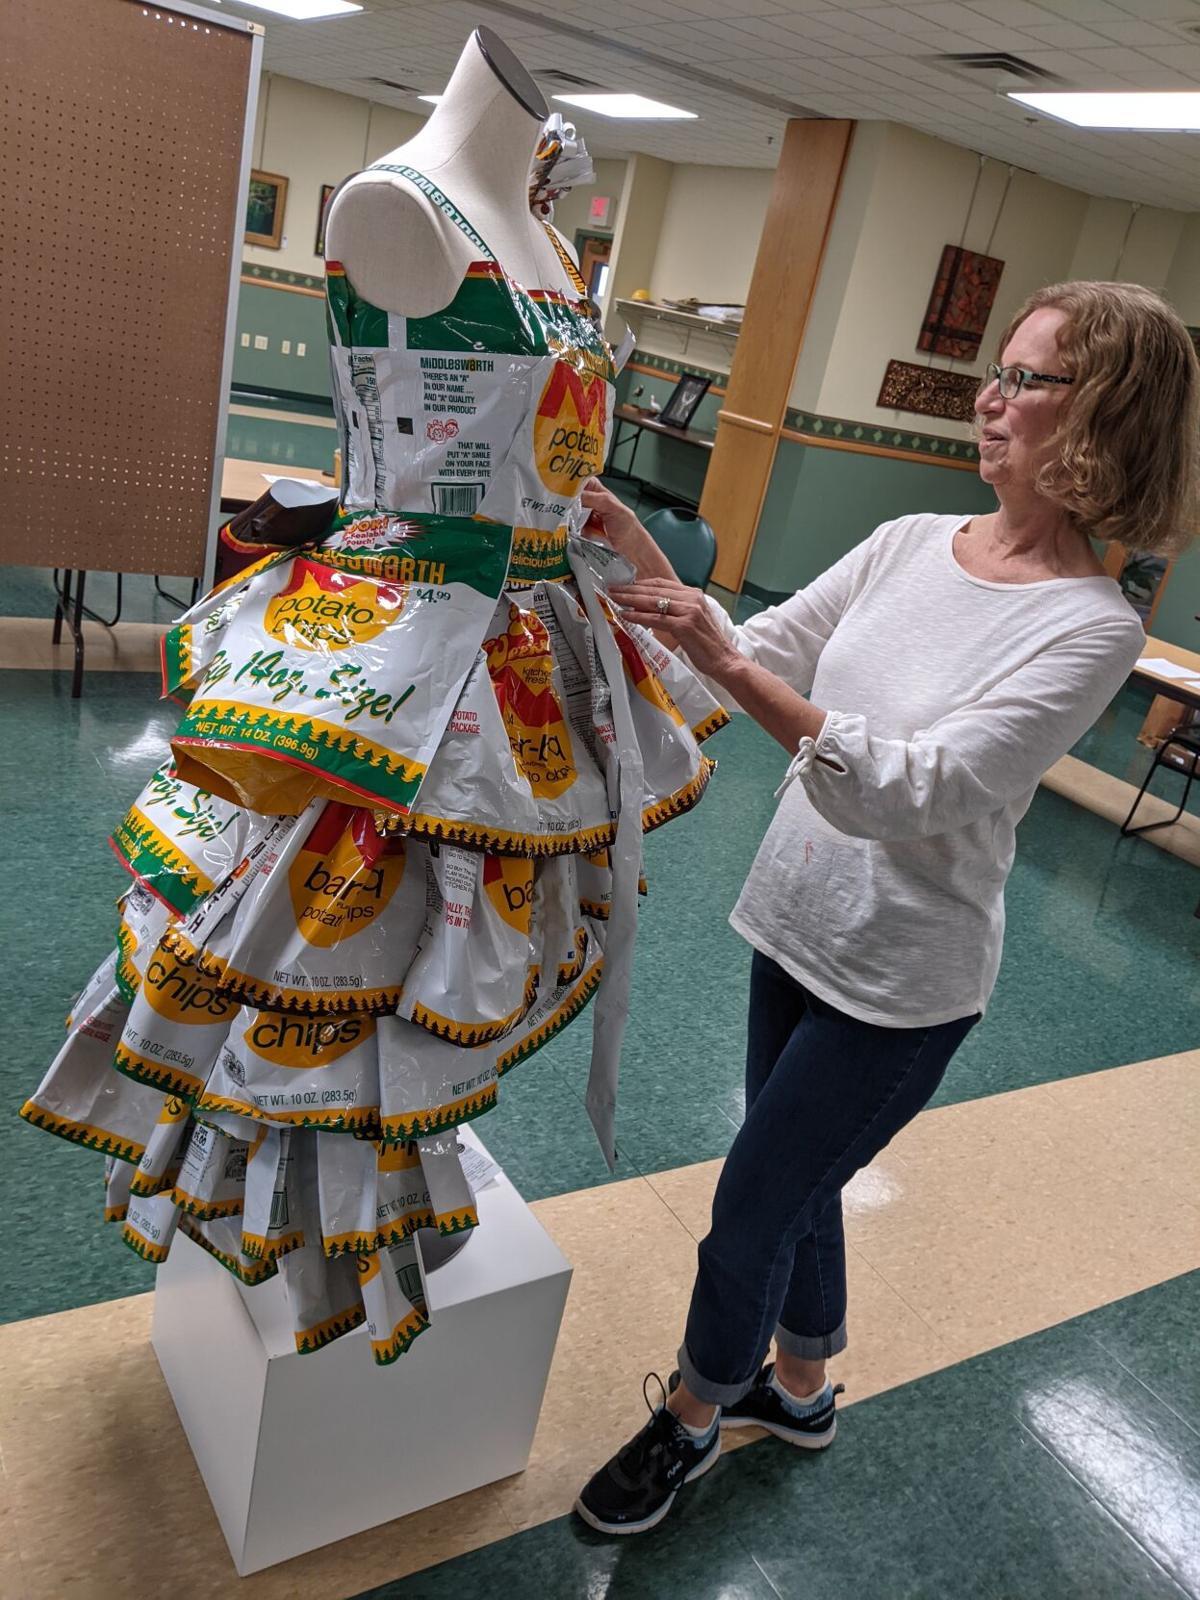 Susquehanna Art Society's annual show debuts Tuesday in Sunbury